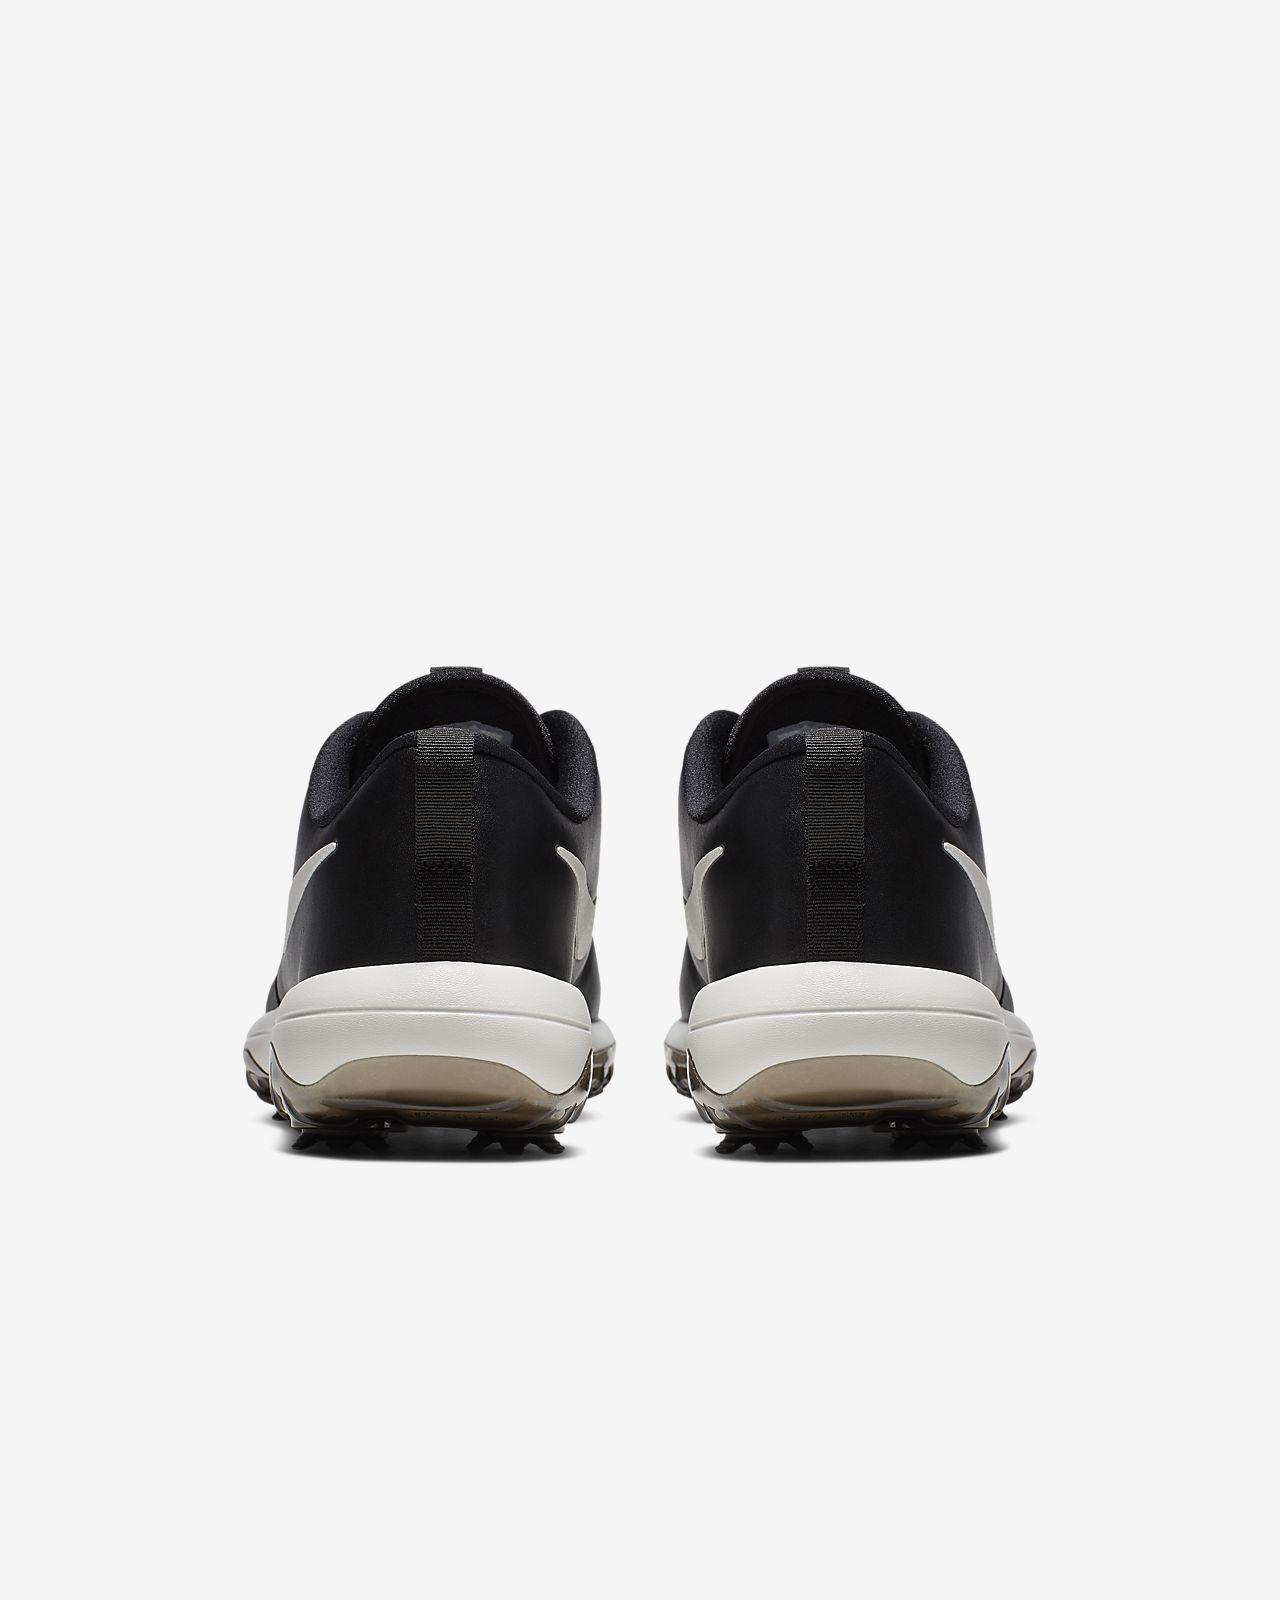 f85d44711a9 Nike Roshe G Tour Men s Golf Shoe. Nike.com IE